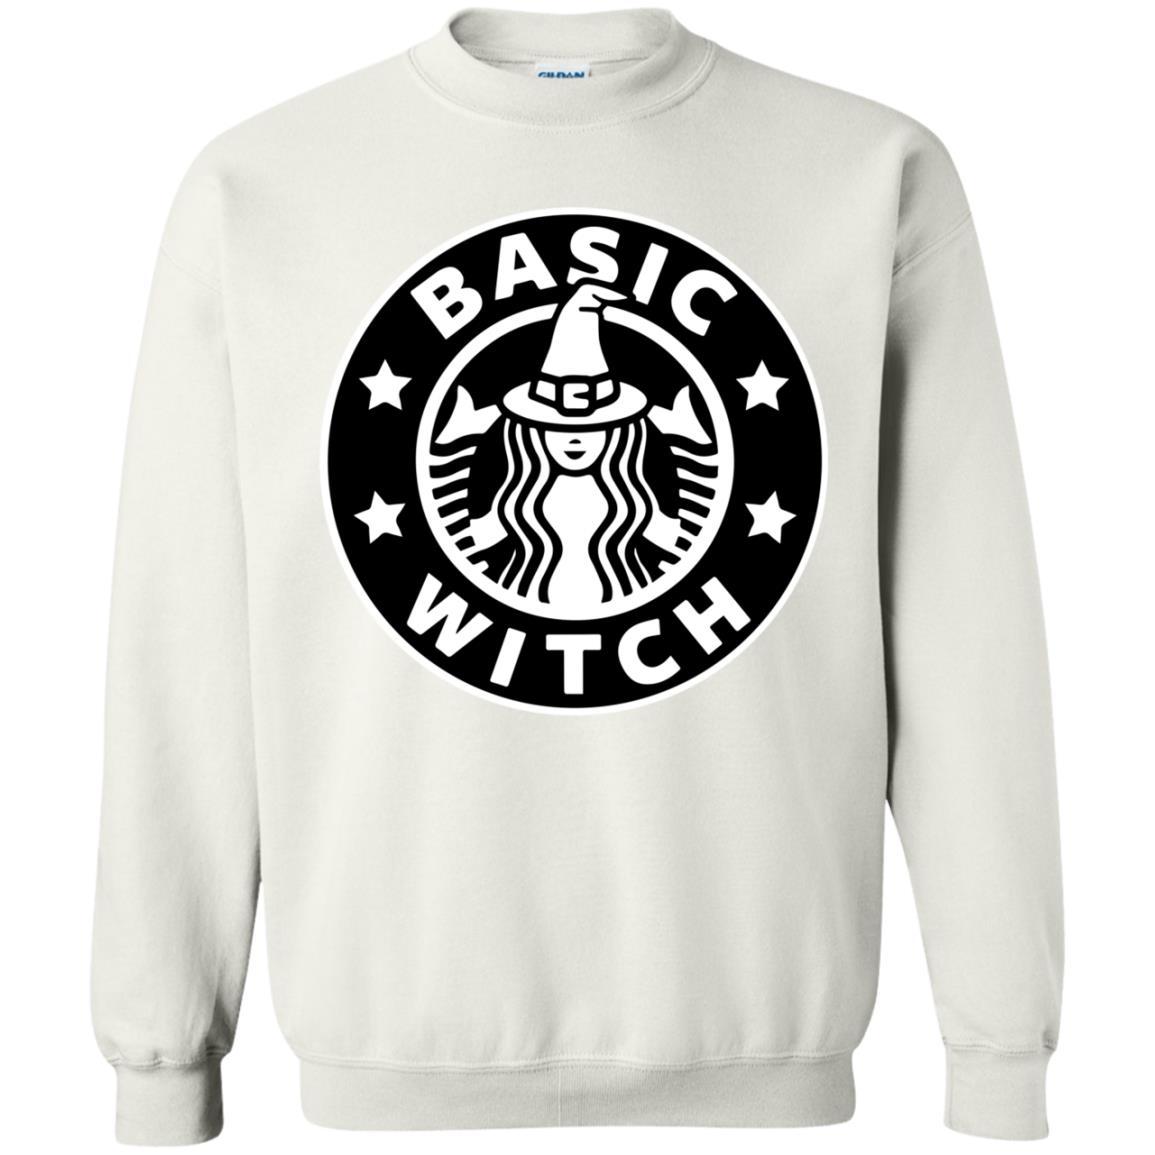 image 1021 - Basic Witch Shirt, Halloween Starbuck parody